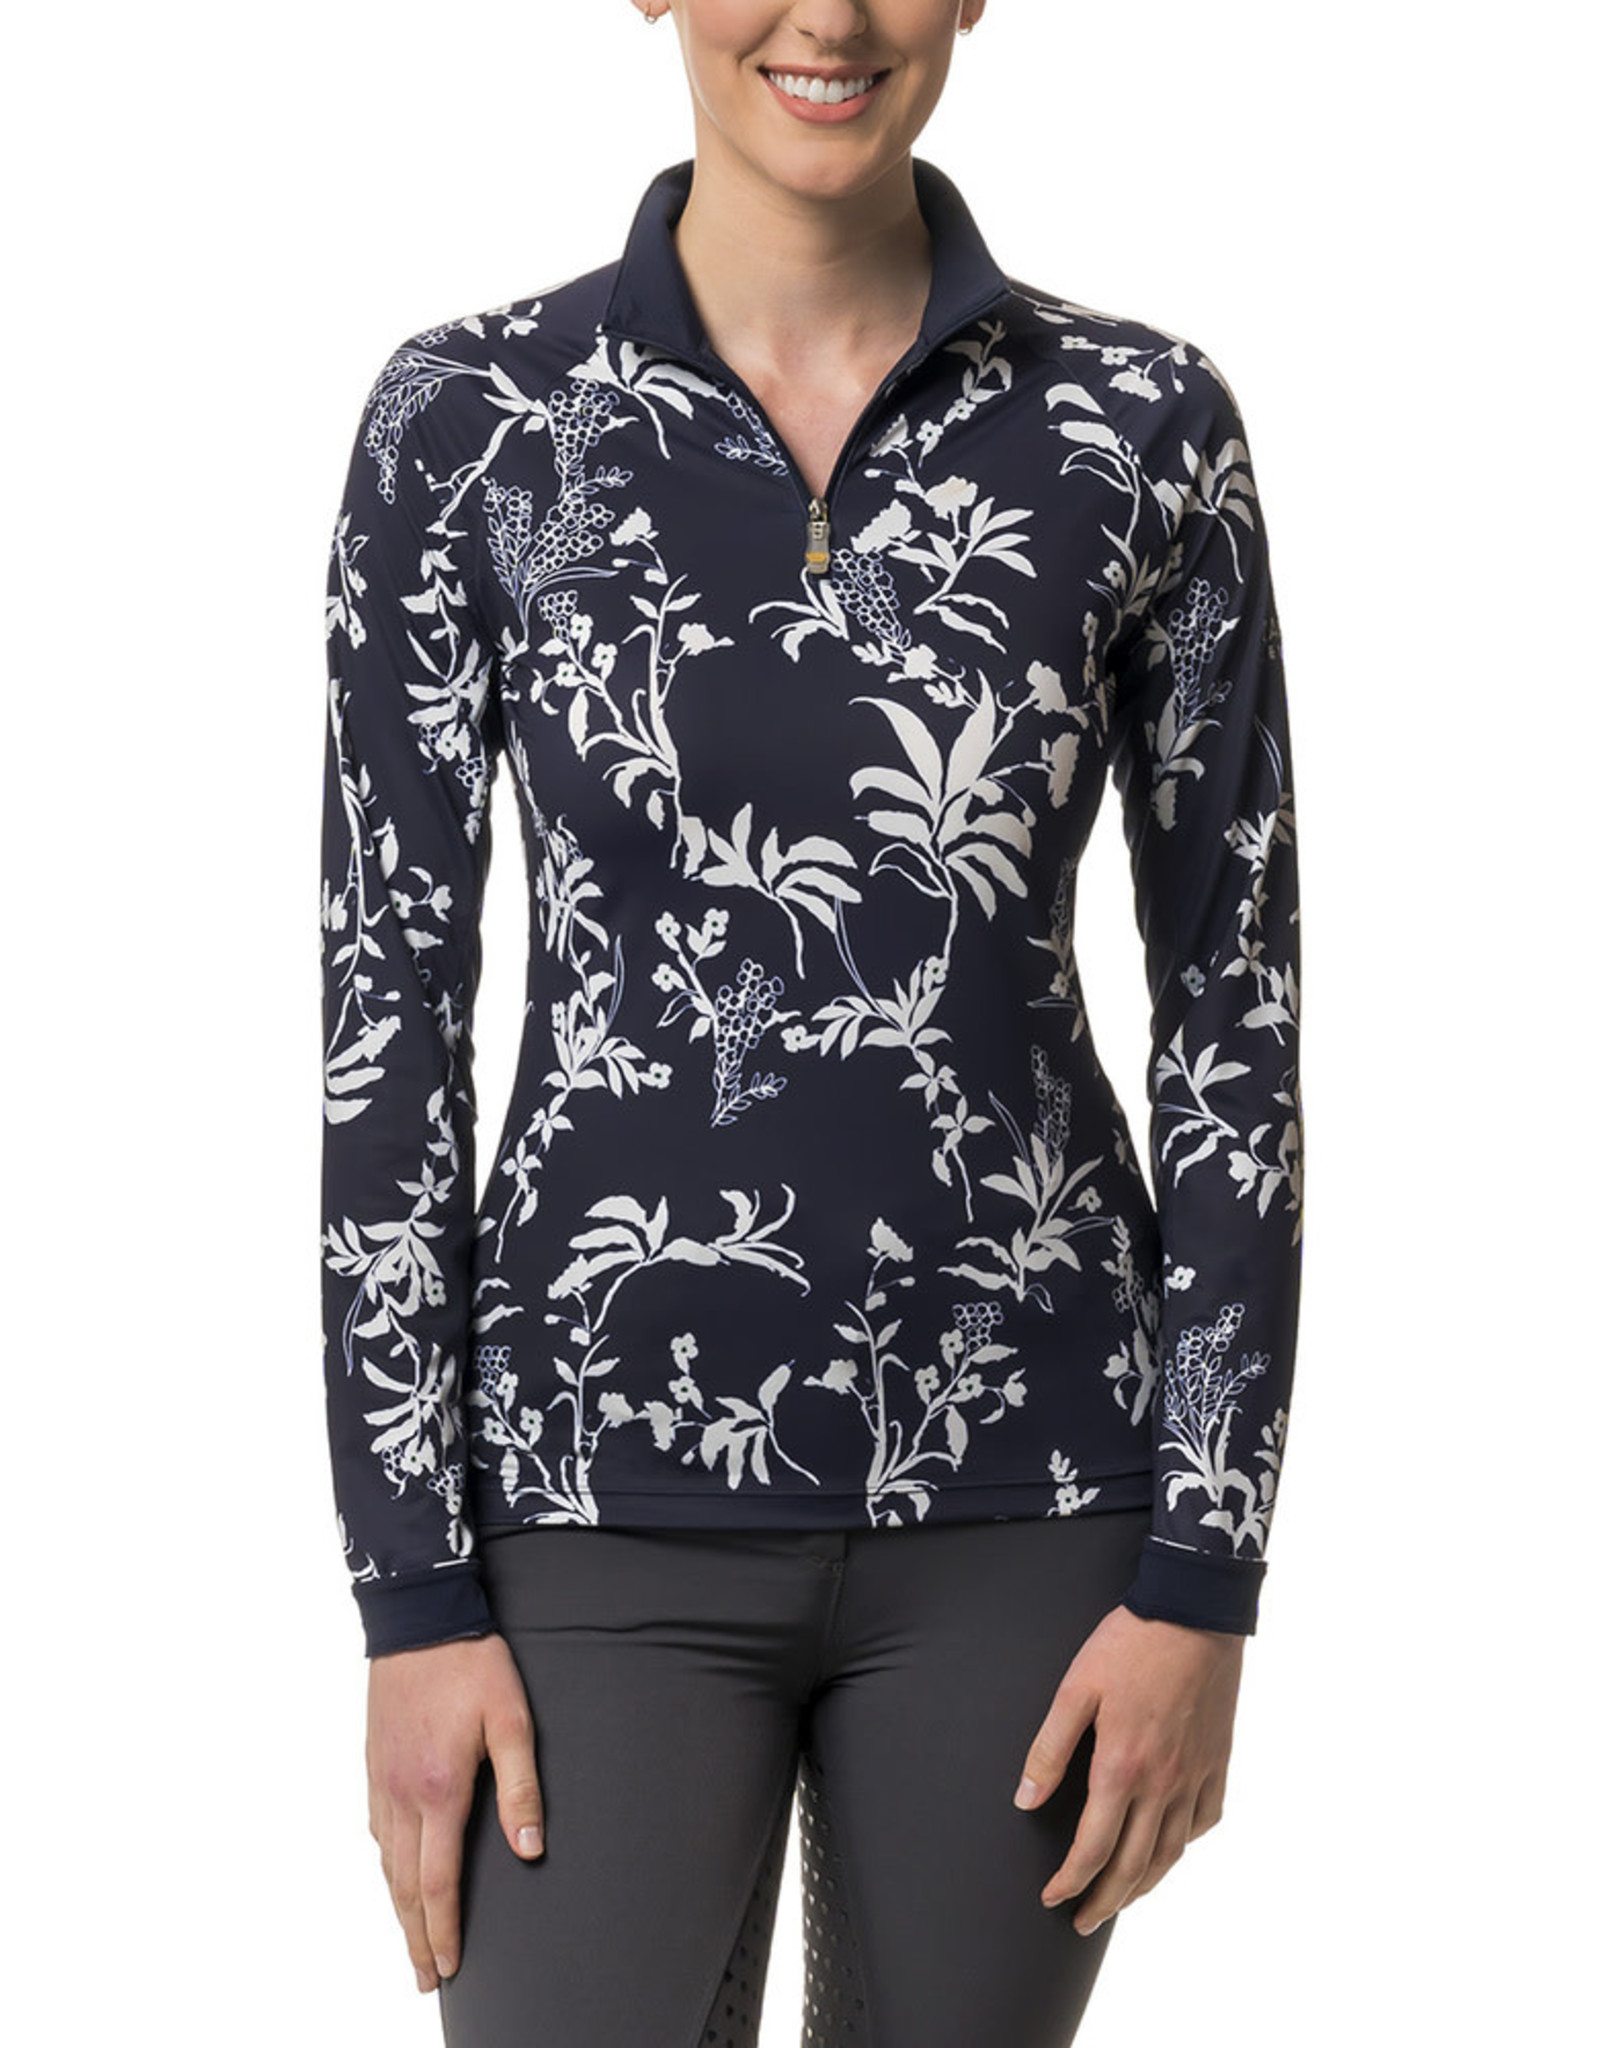 Kastel Sun Shirt Long Sleeve Raglan 1/4 Zip Navy and White Floral